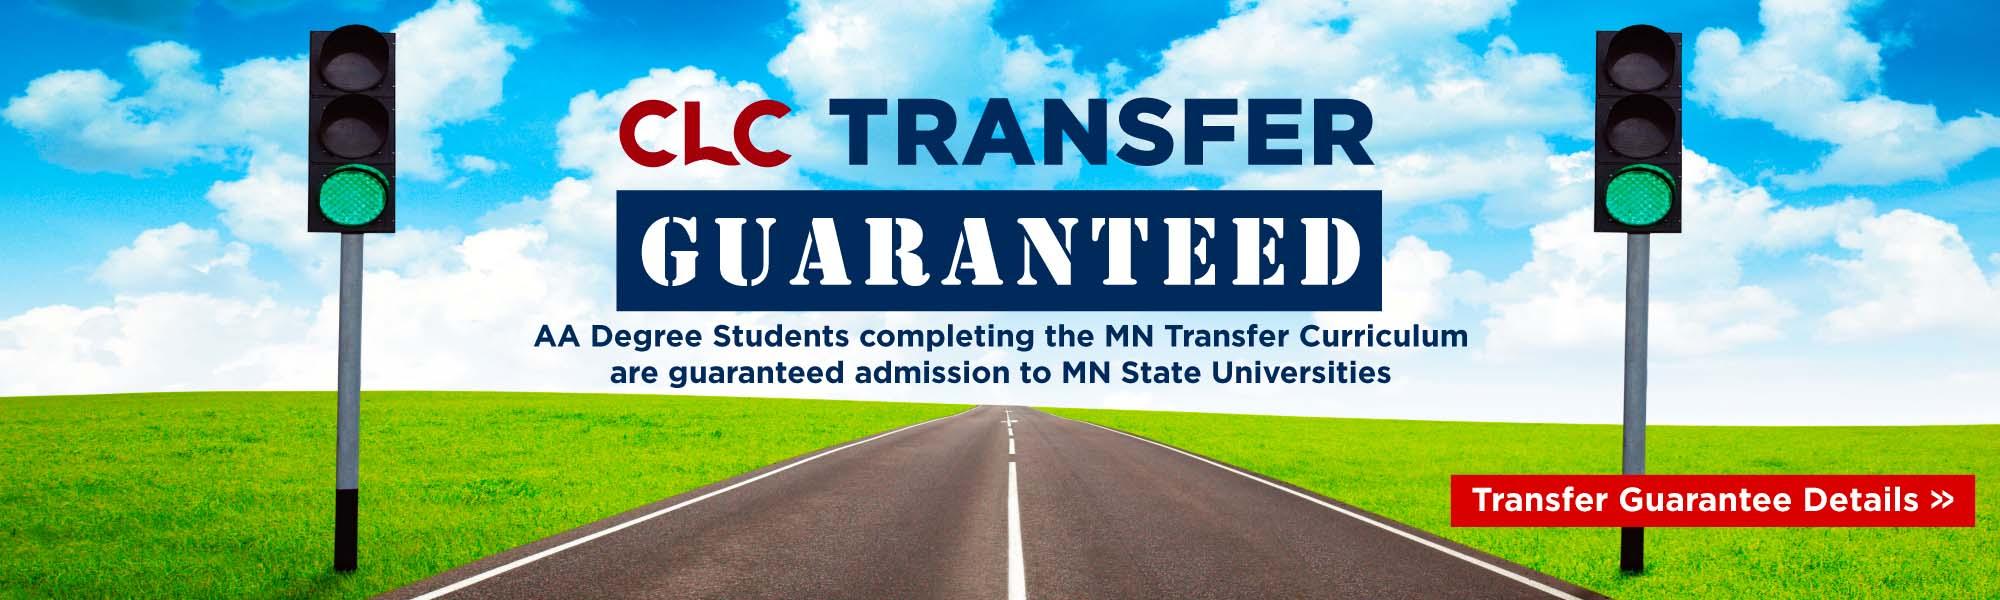 transfer guaranteed